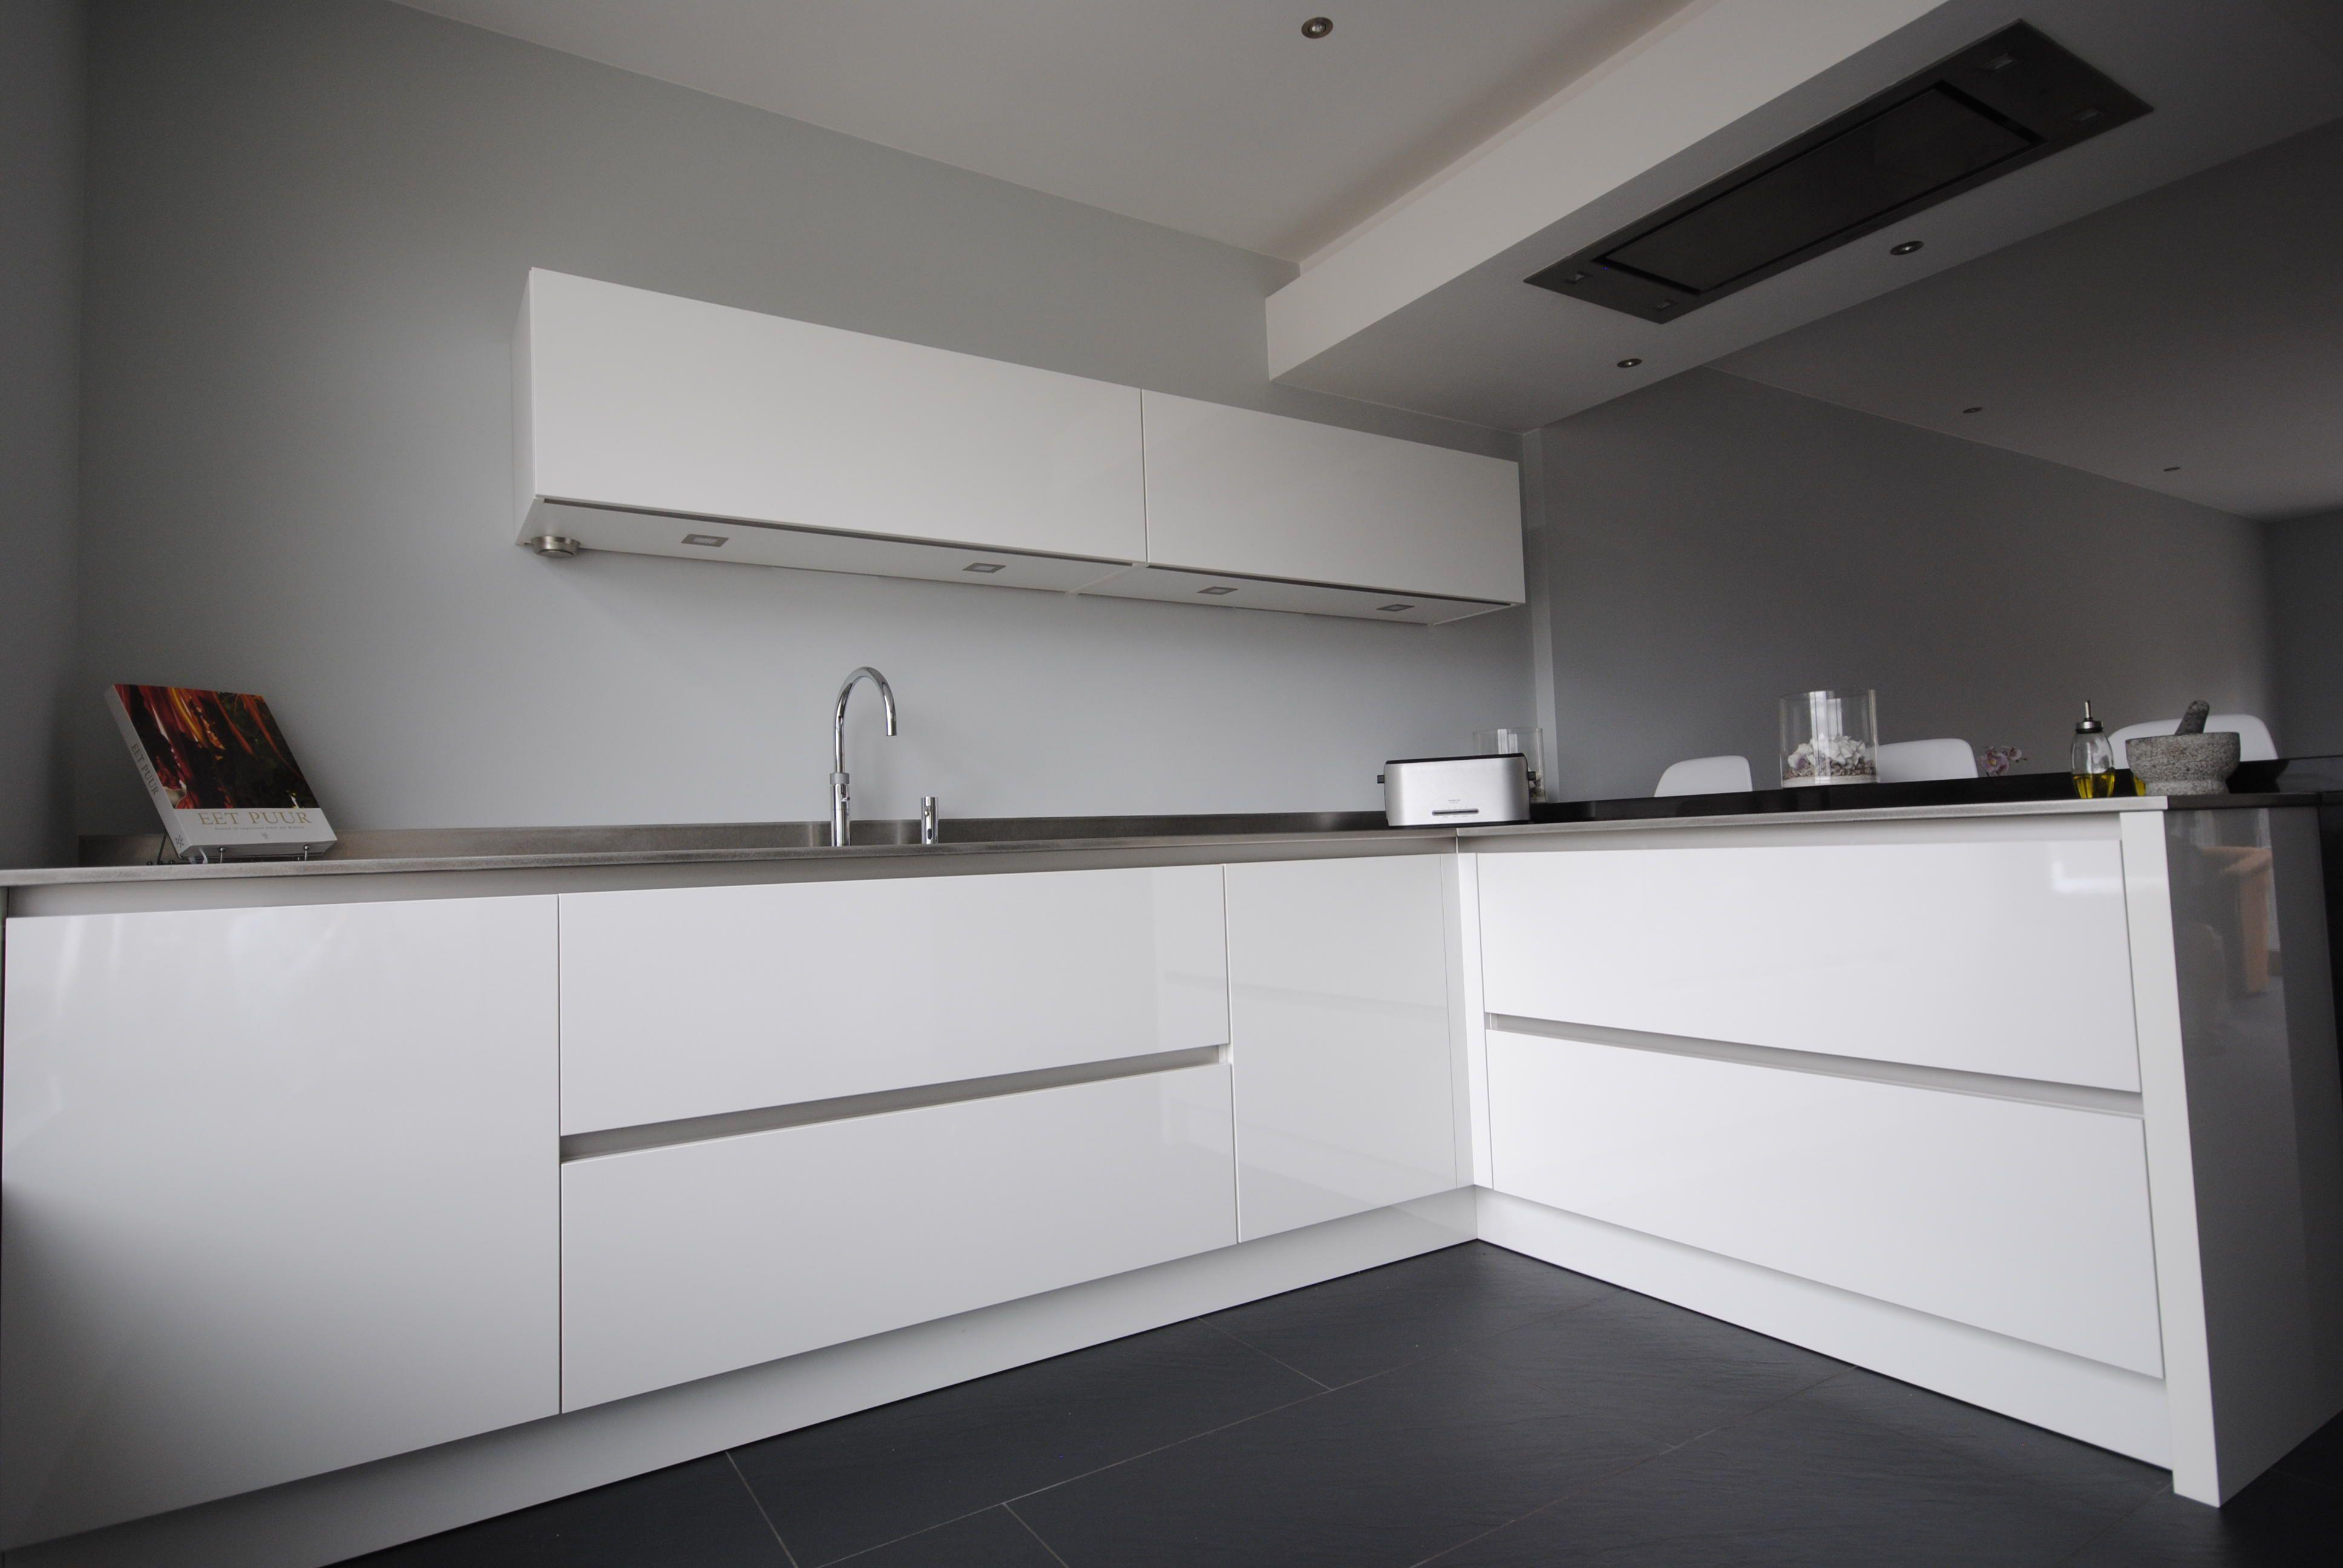 Moderne Hoogglans Keuken : Moderne hoogglans keuken moderne keuken